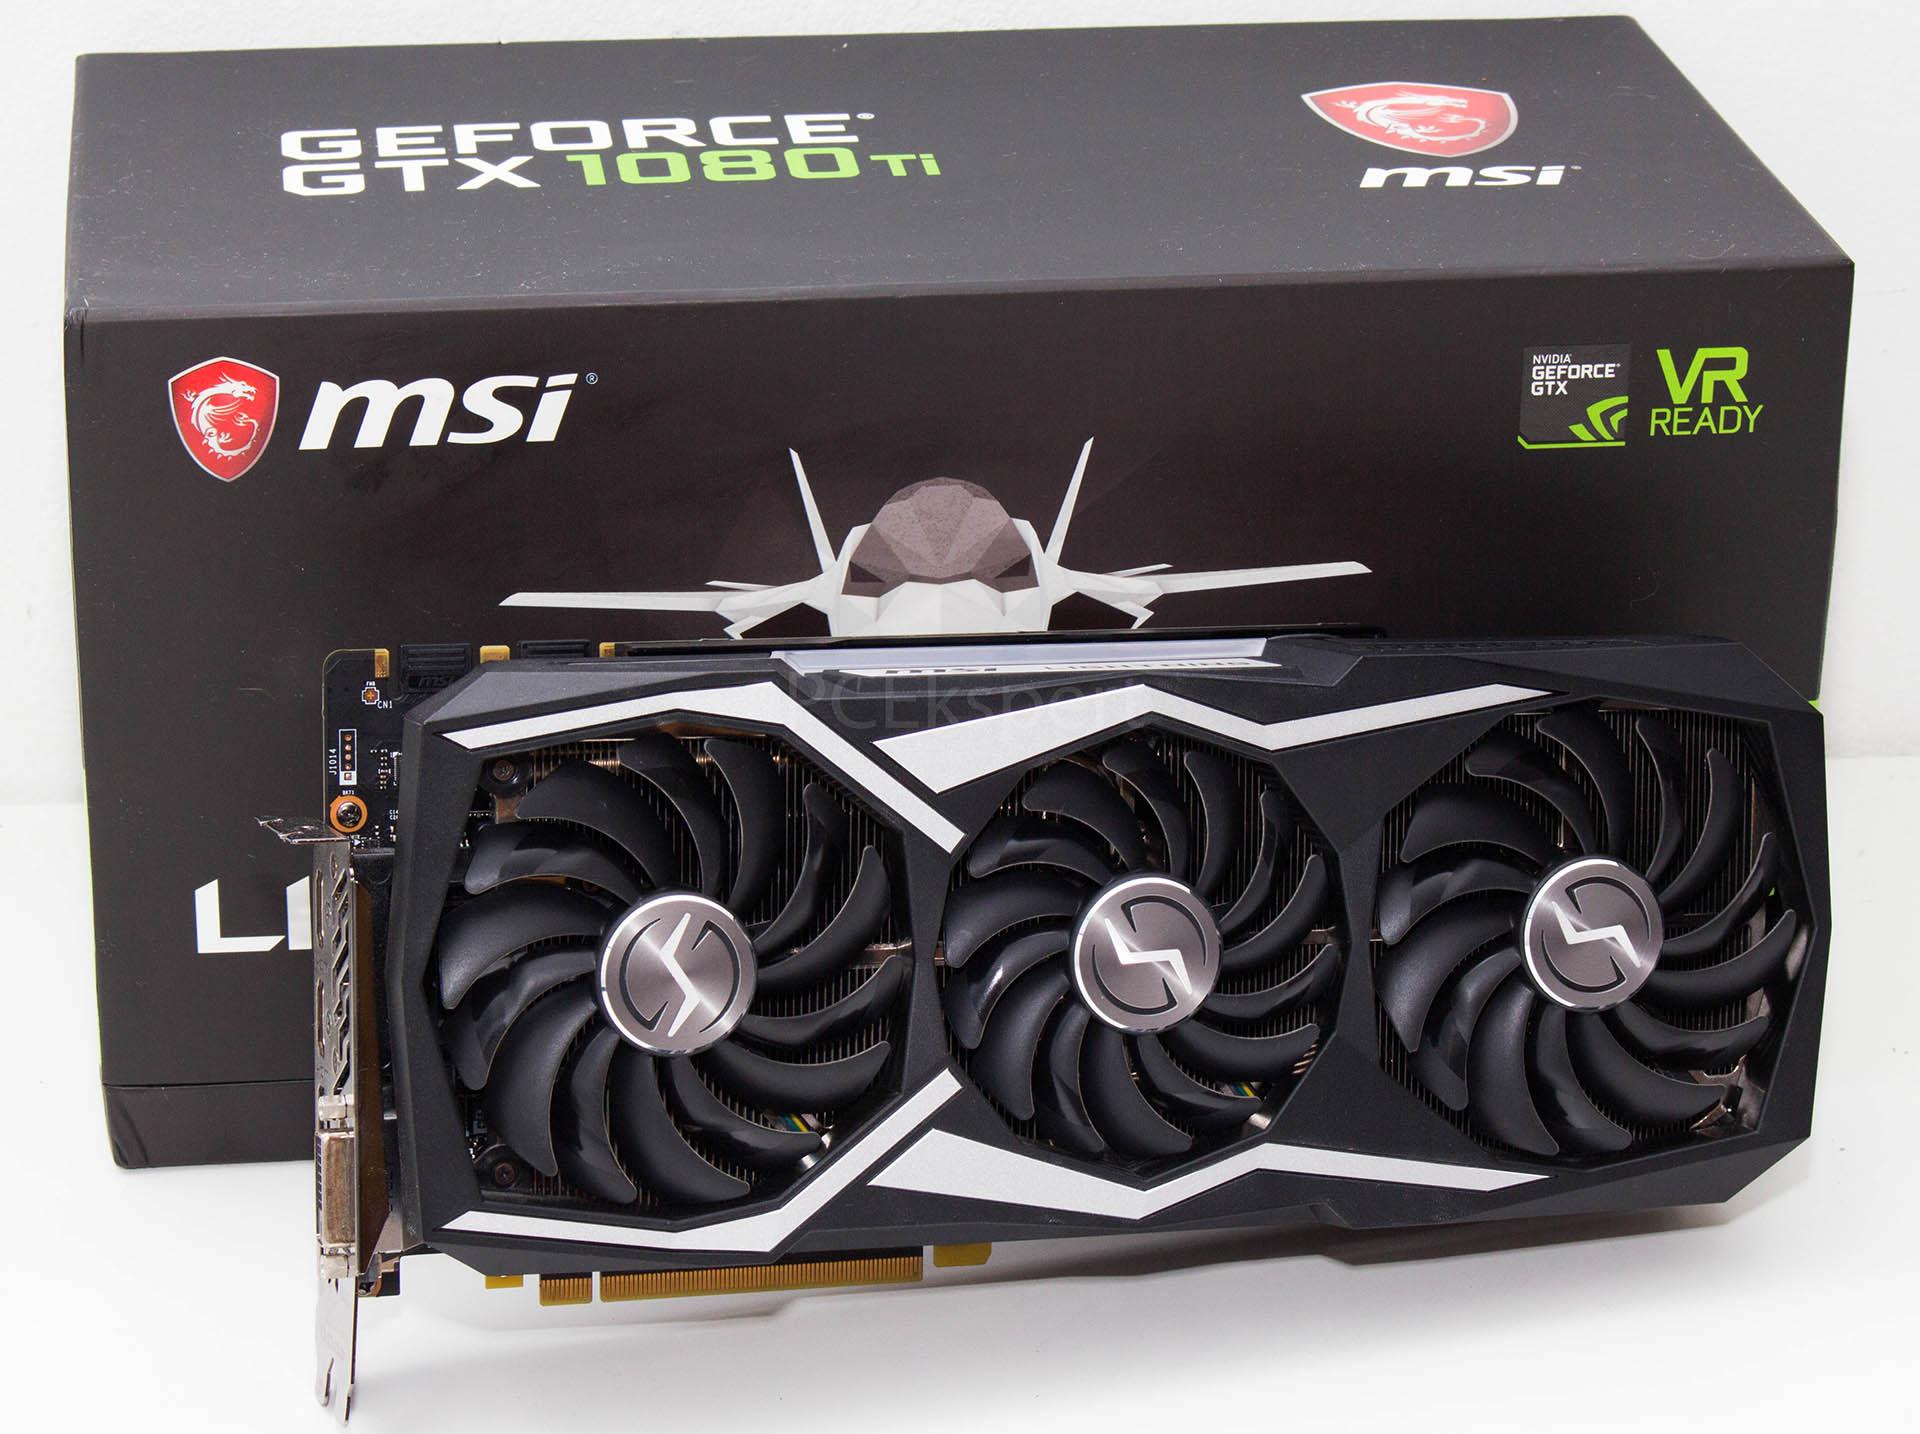 MSI GeForce GTX 1080 Ti Lightning recenzija